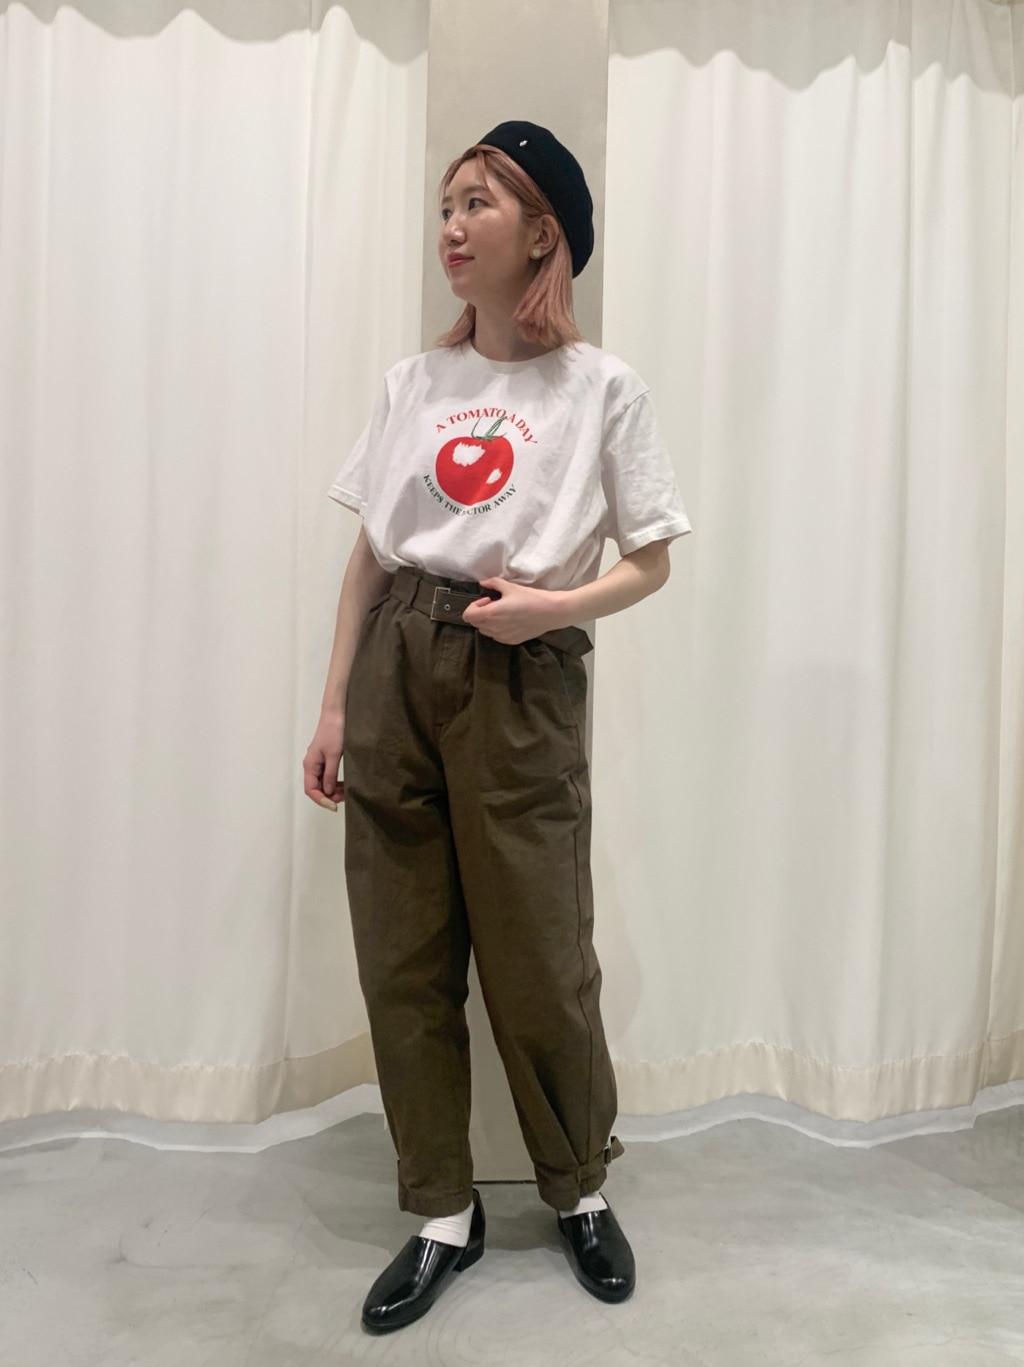 CHILD WOMAN , PAR ICI 東京スカイツリータウン・ソラマチ 2021.05.14